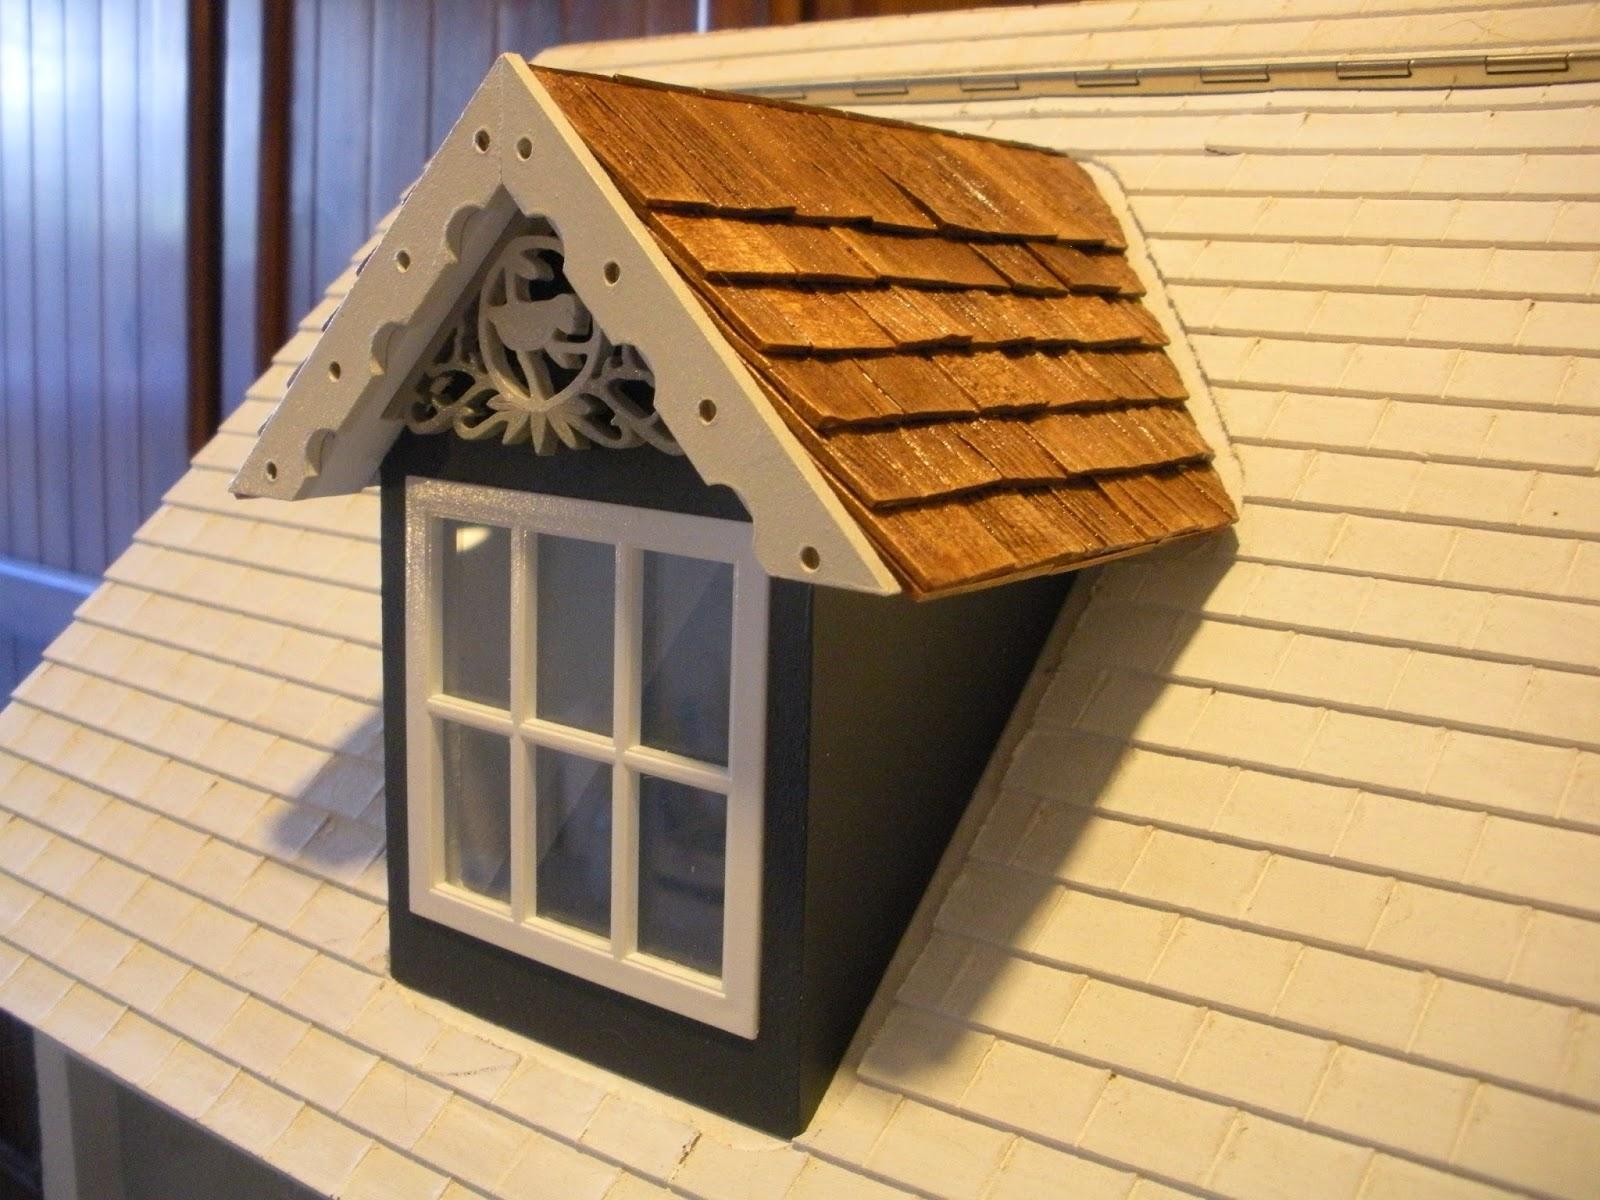 The Dollhouse Dollhouse Exterior Roof Top Dormers